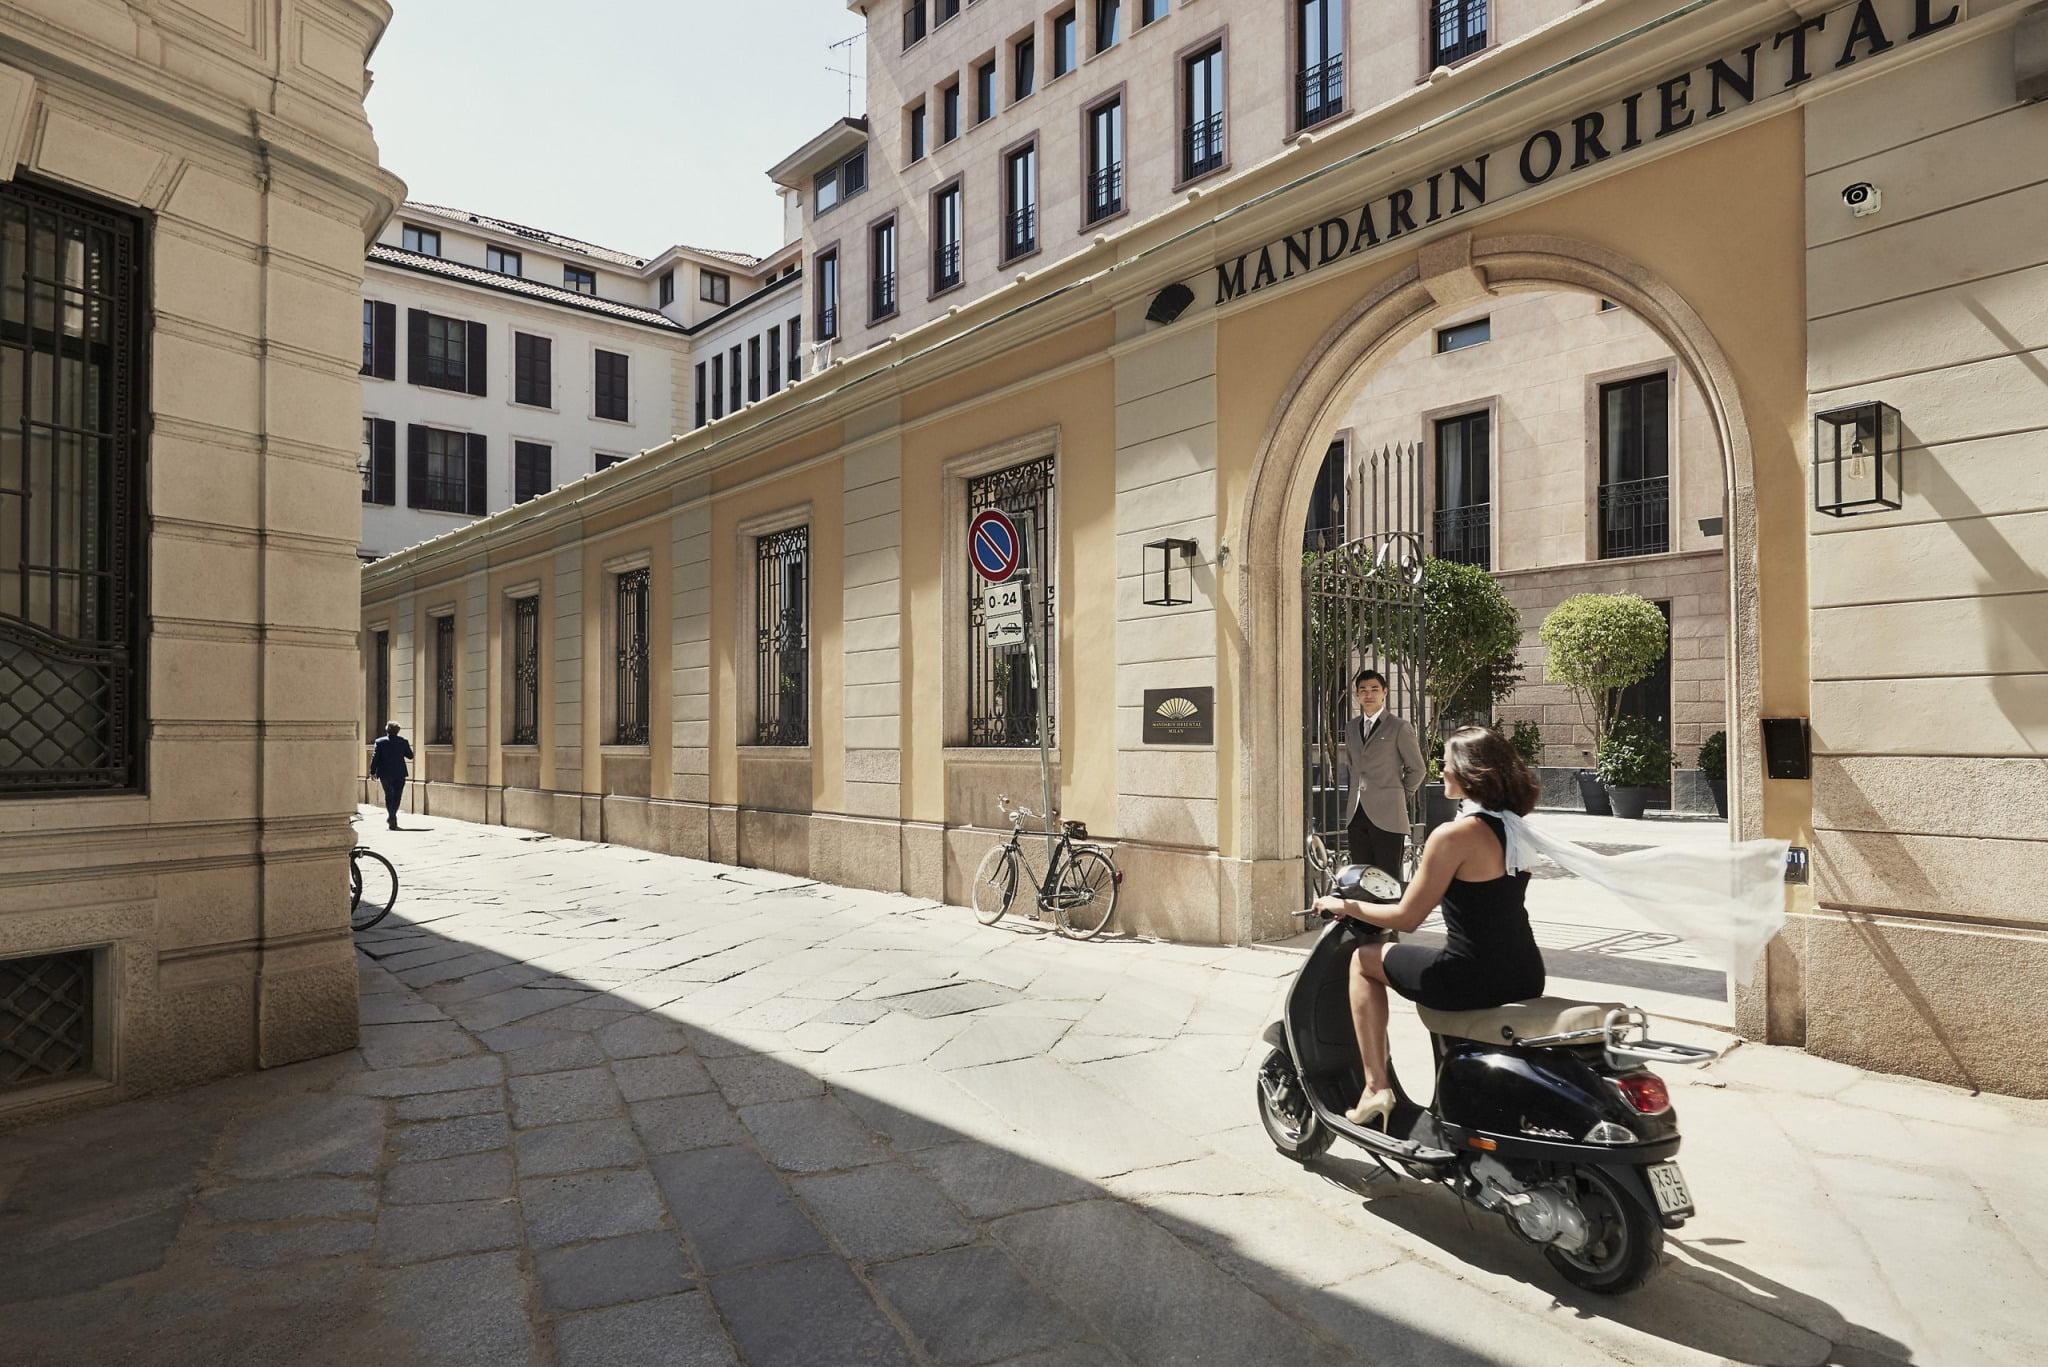 Miláno Mandarin Oriental